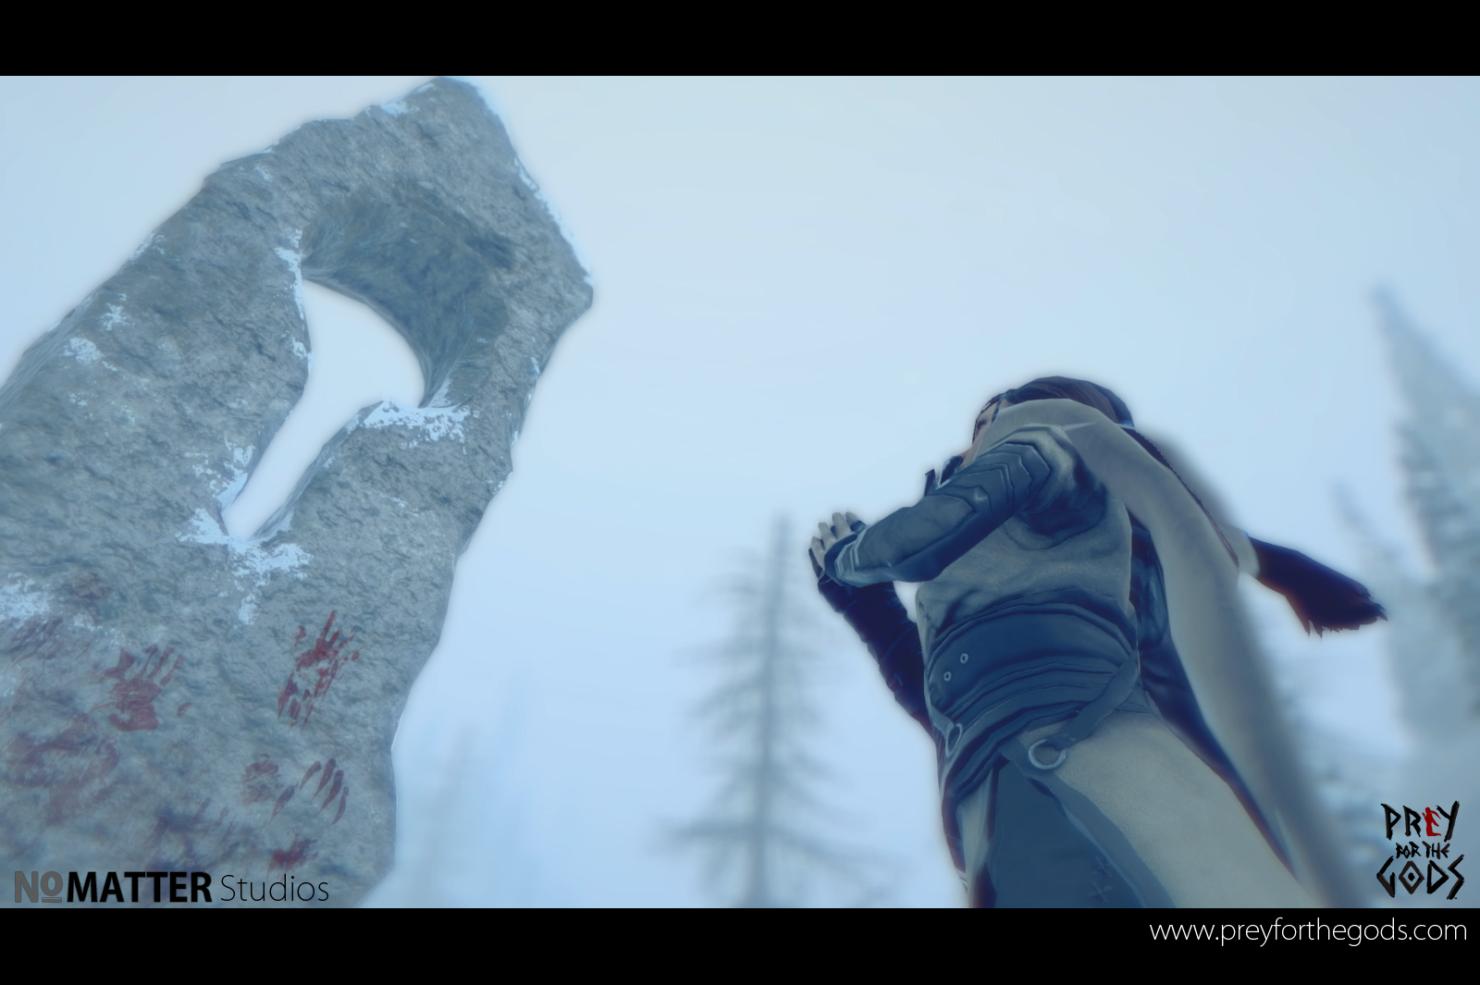 prey-for-the-gods-8